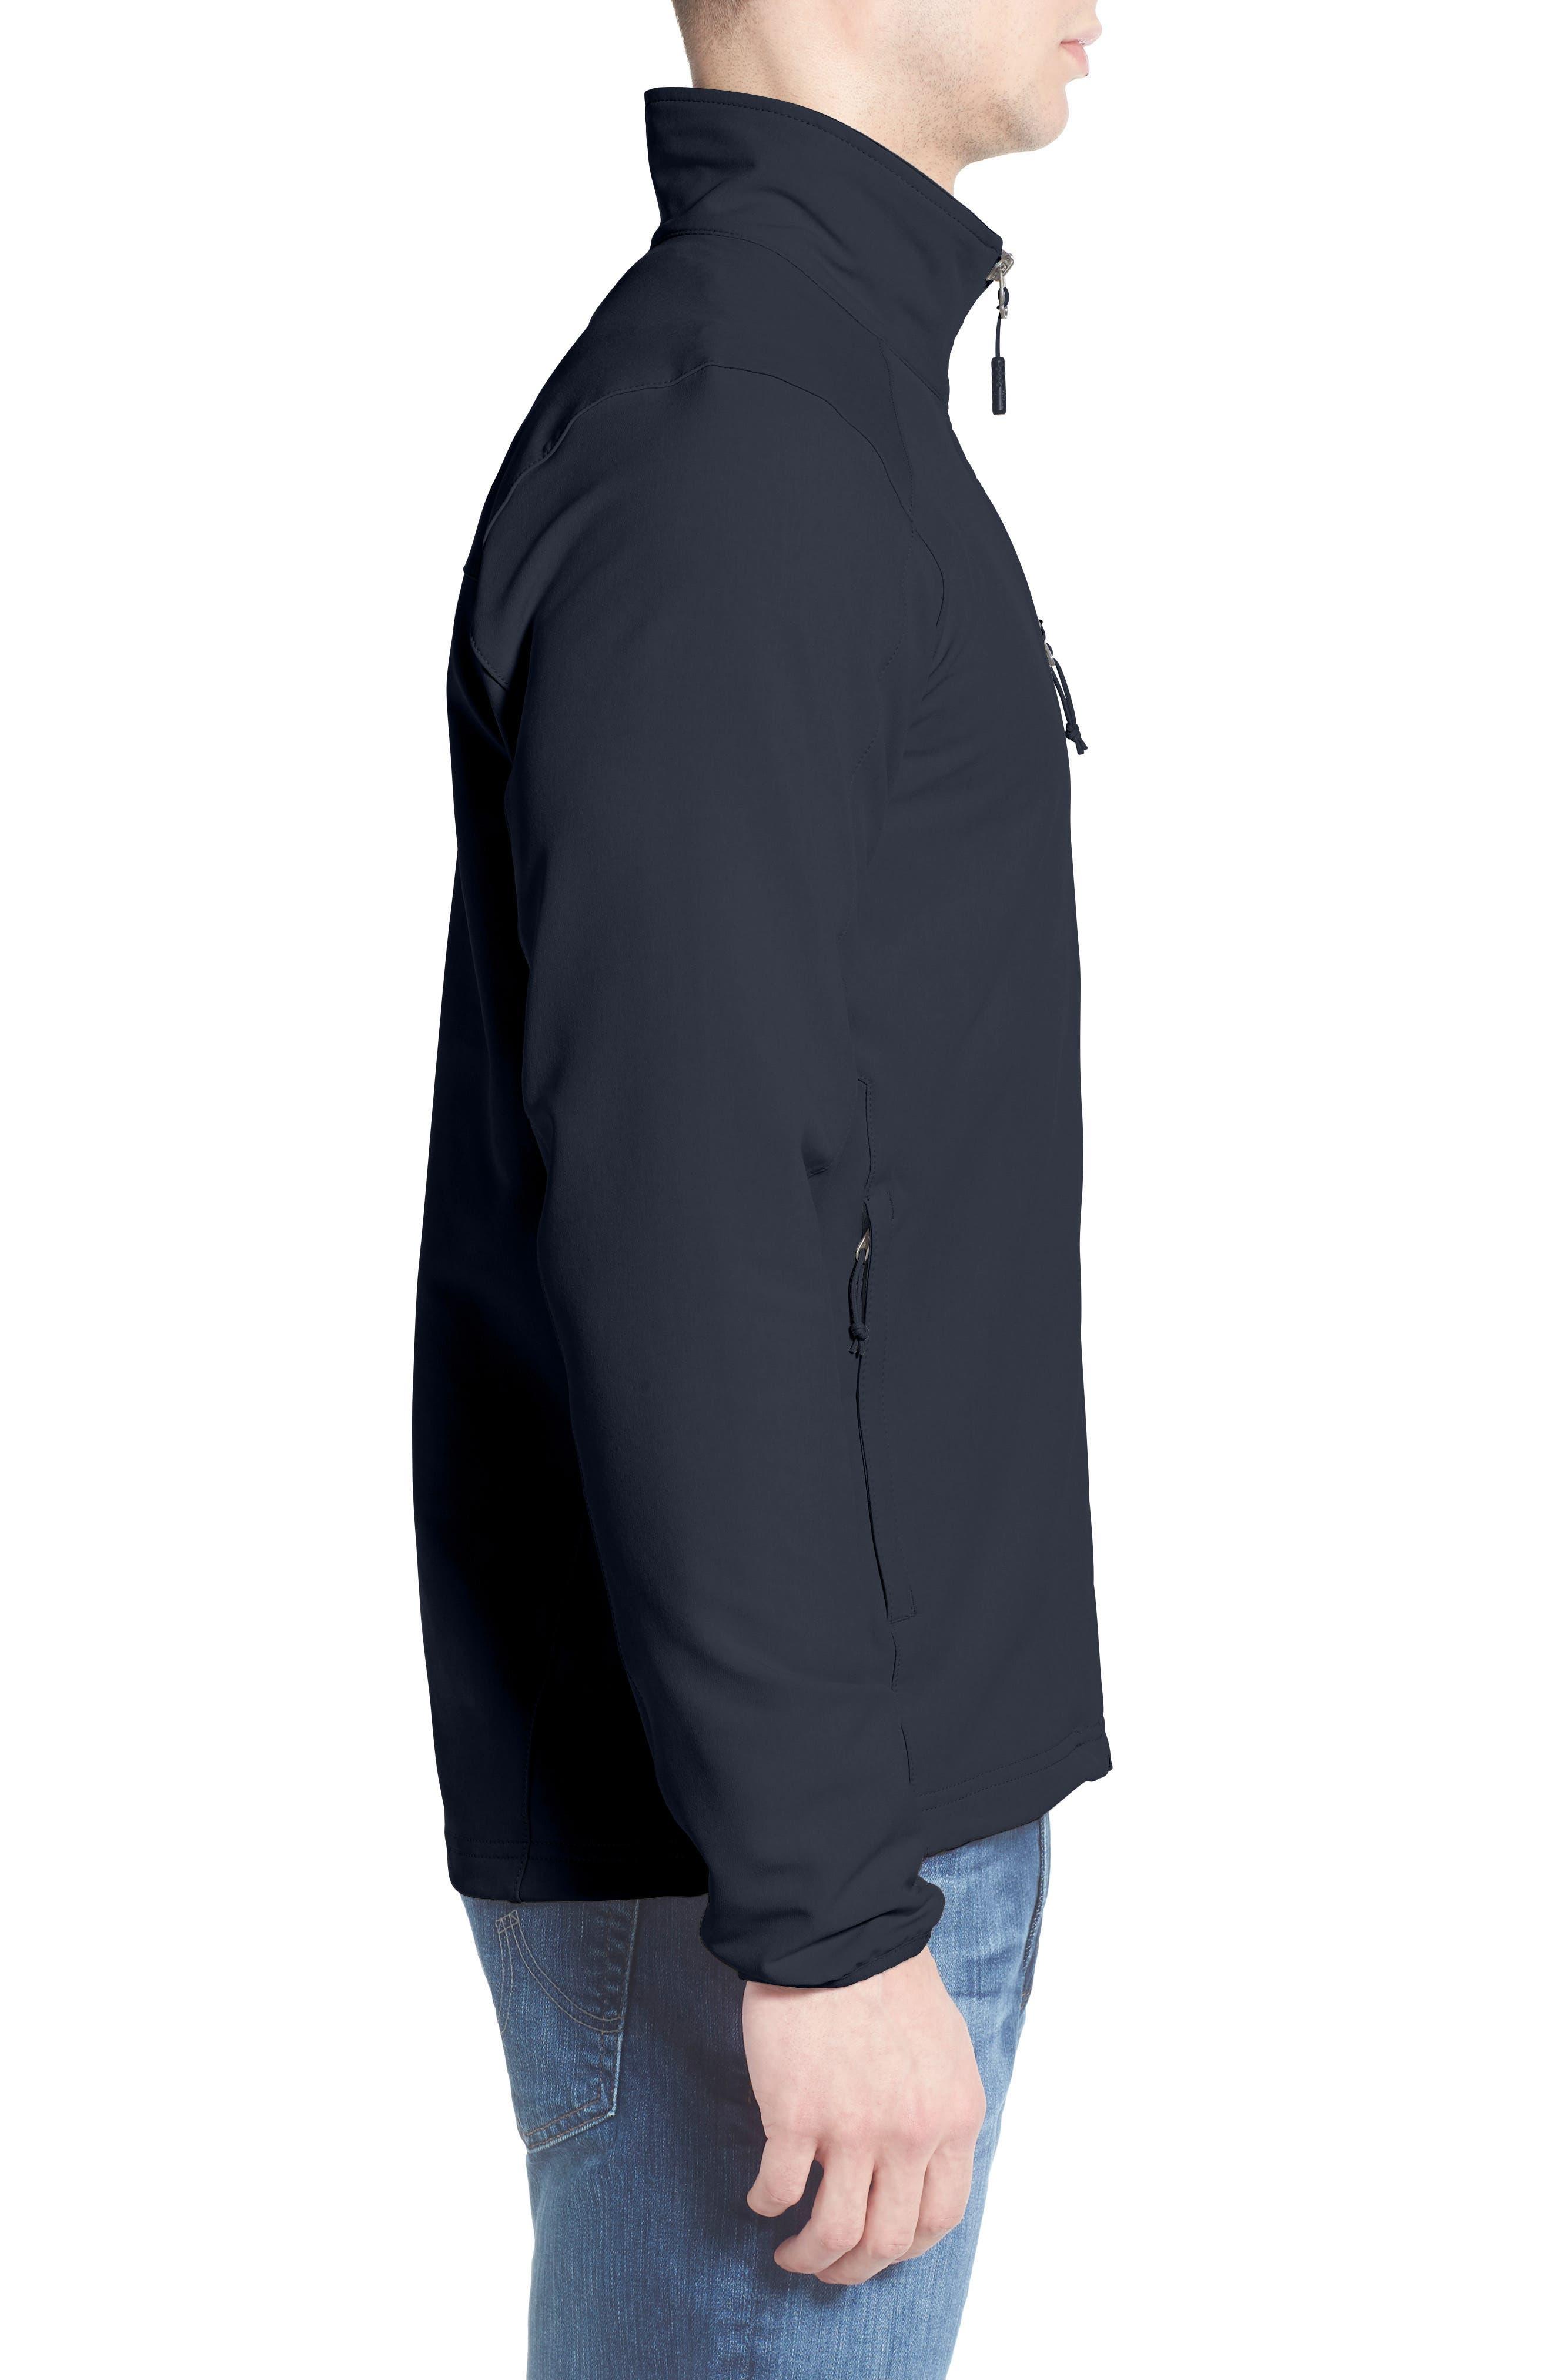 Apex Pneumatic Jacket,                             Alternate thumbnail 2, color,                             425